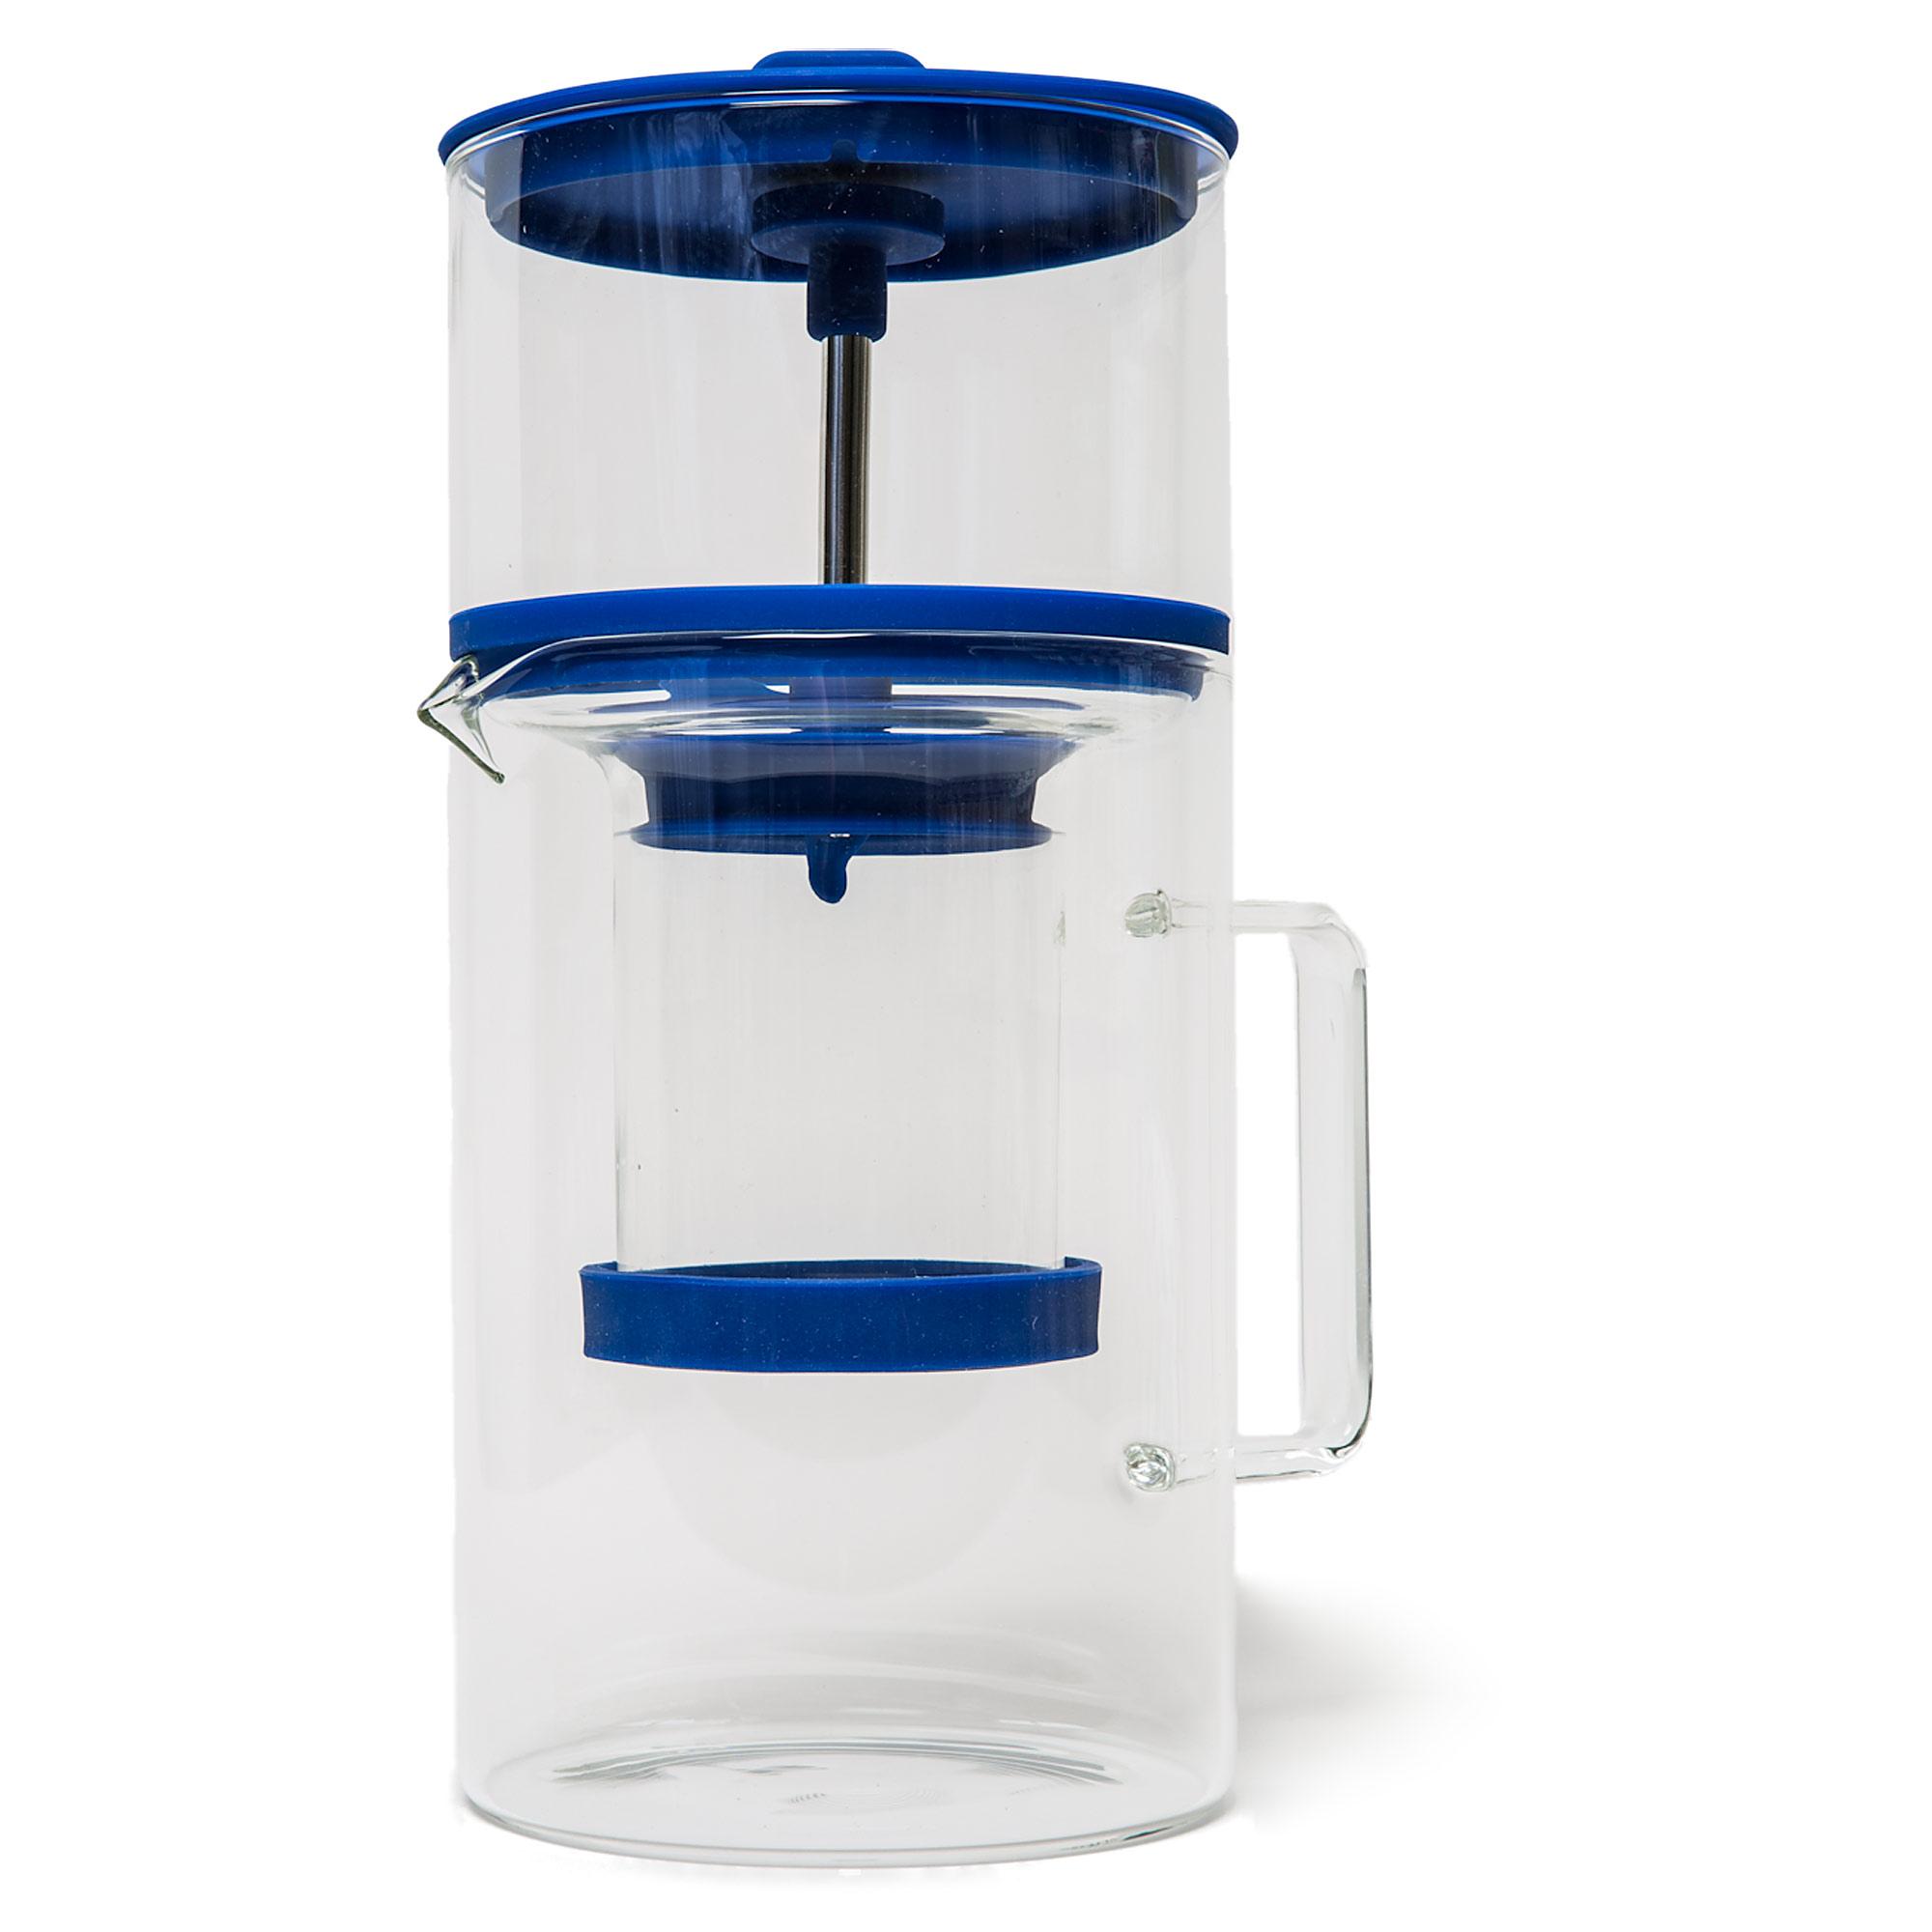 America S Test Kitchen Coffee Maker